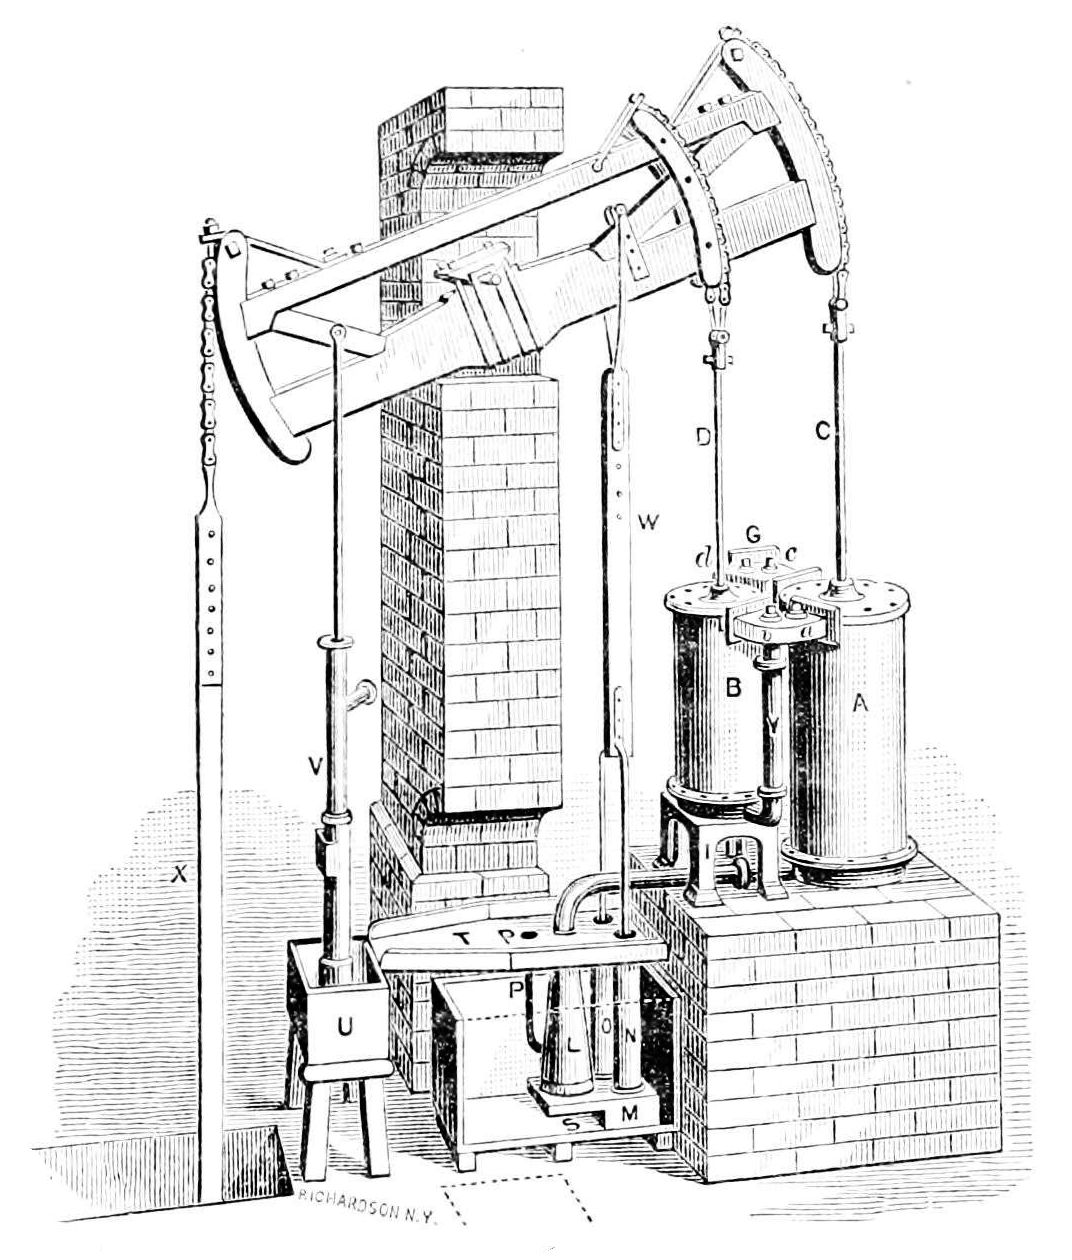 file psm v12 d157 hornblower pound engine 1781 wikimedia Ford V12 Engine file psm v12 d157 hornblower pound engine 1781